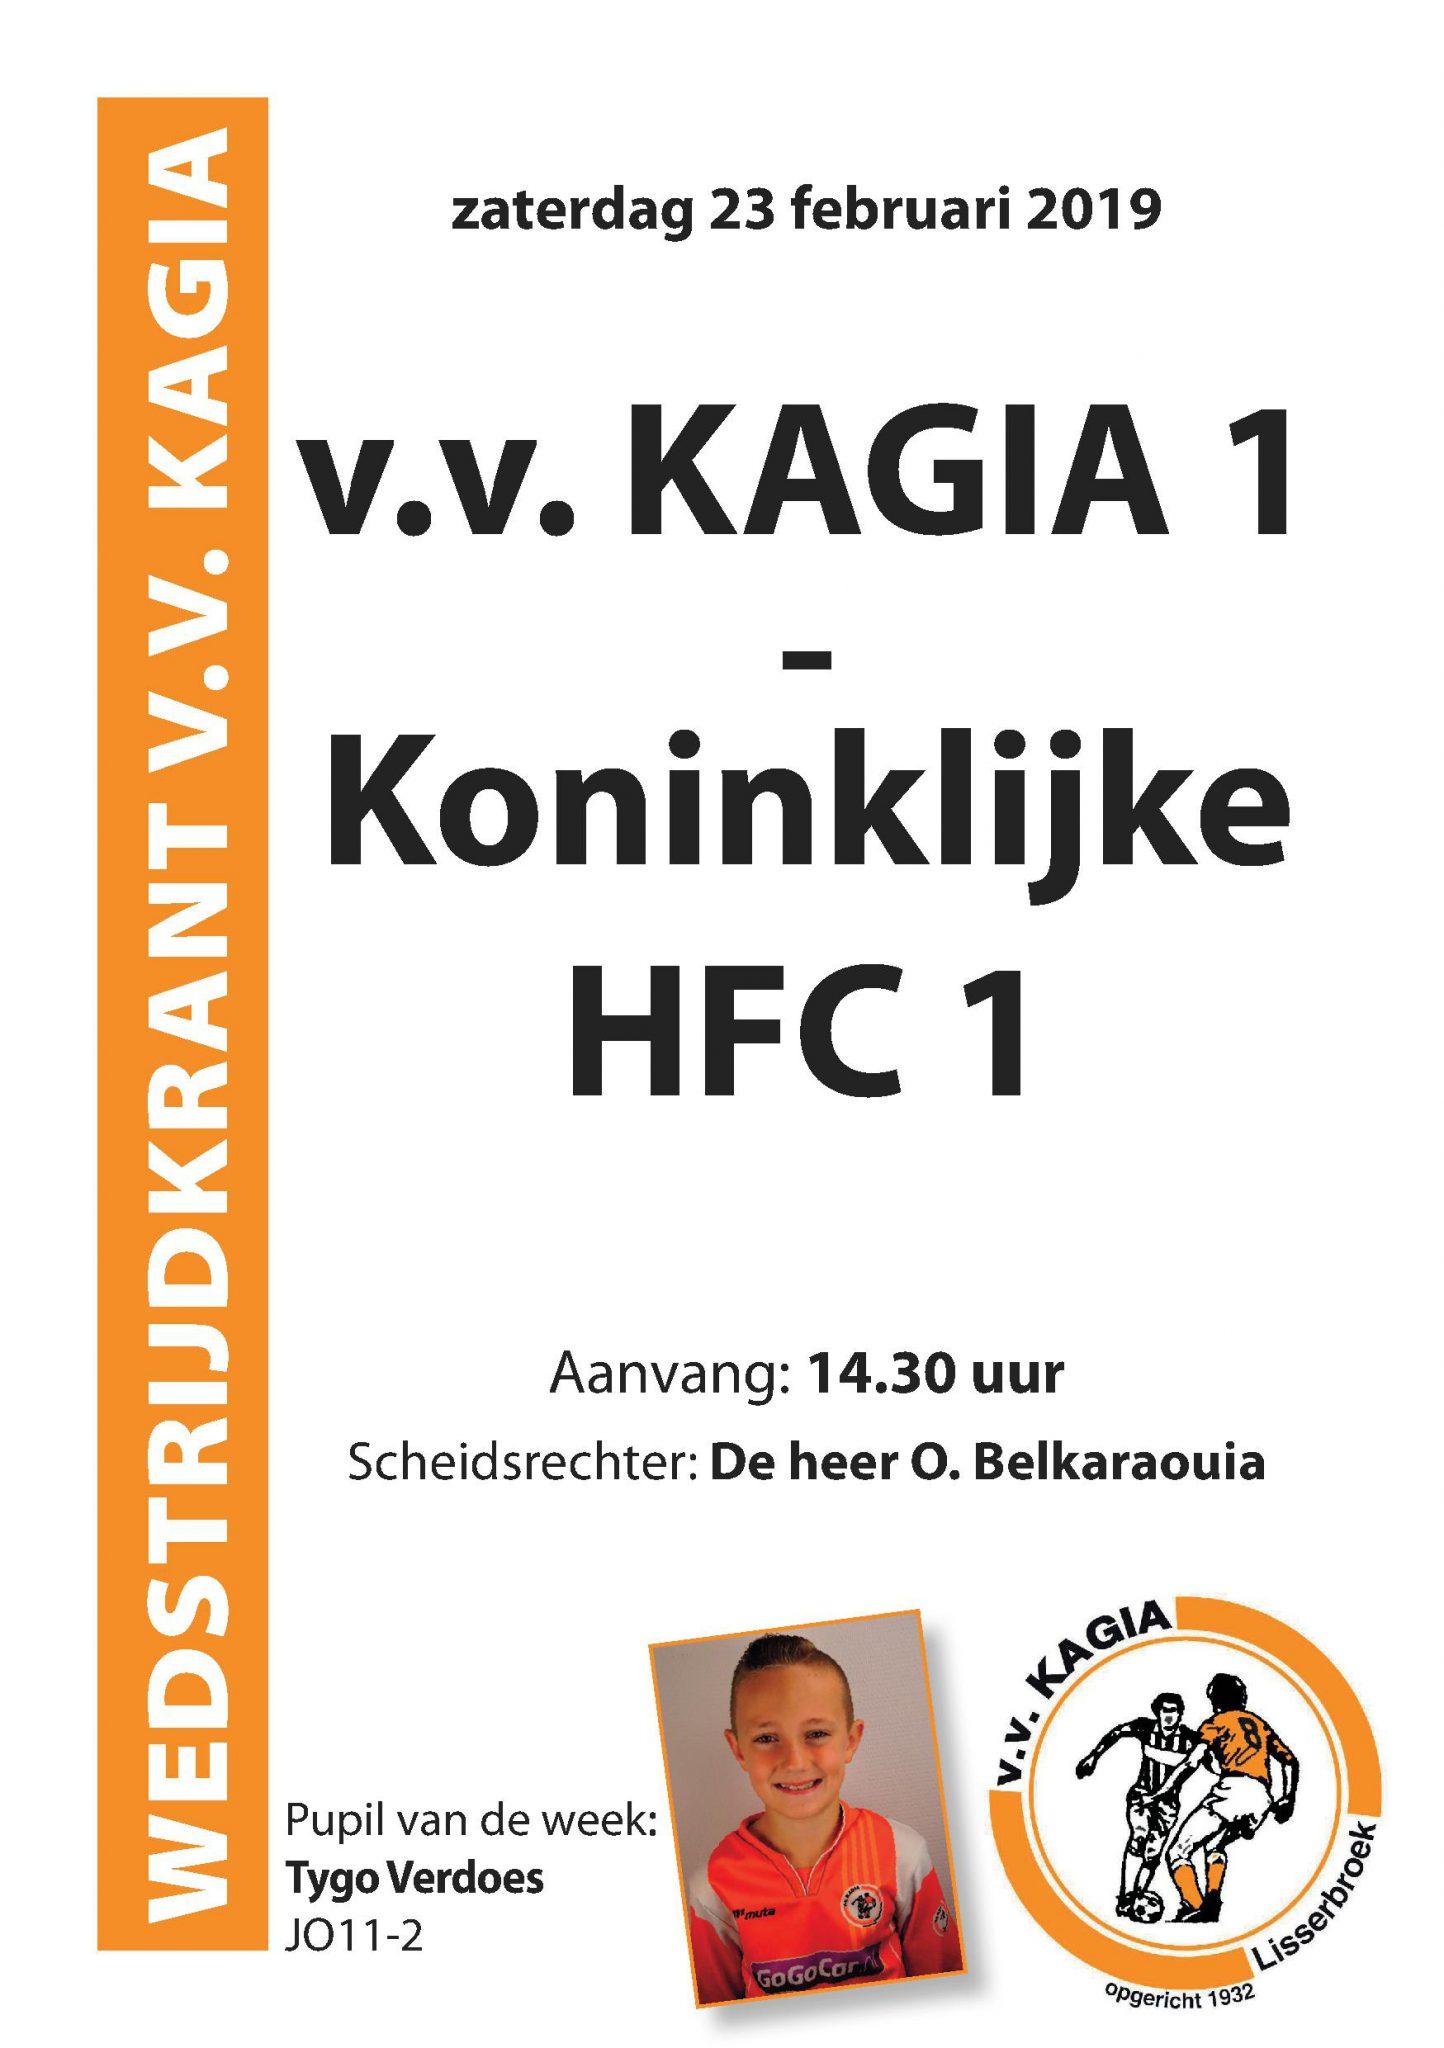 Wedstrijdkrantje | v.v. Kagia 1 – Koninklijke HFC 1